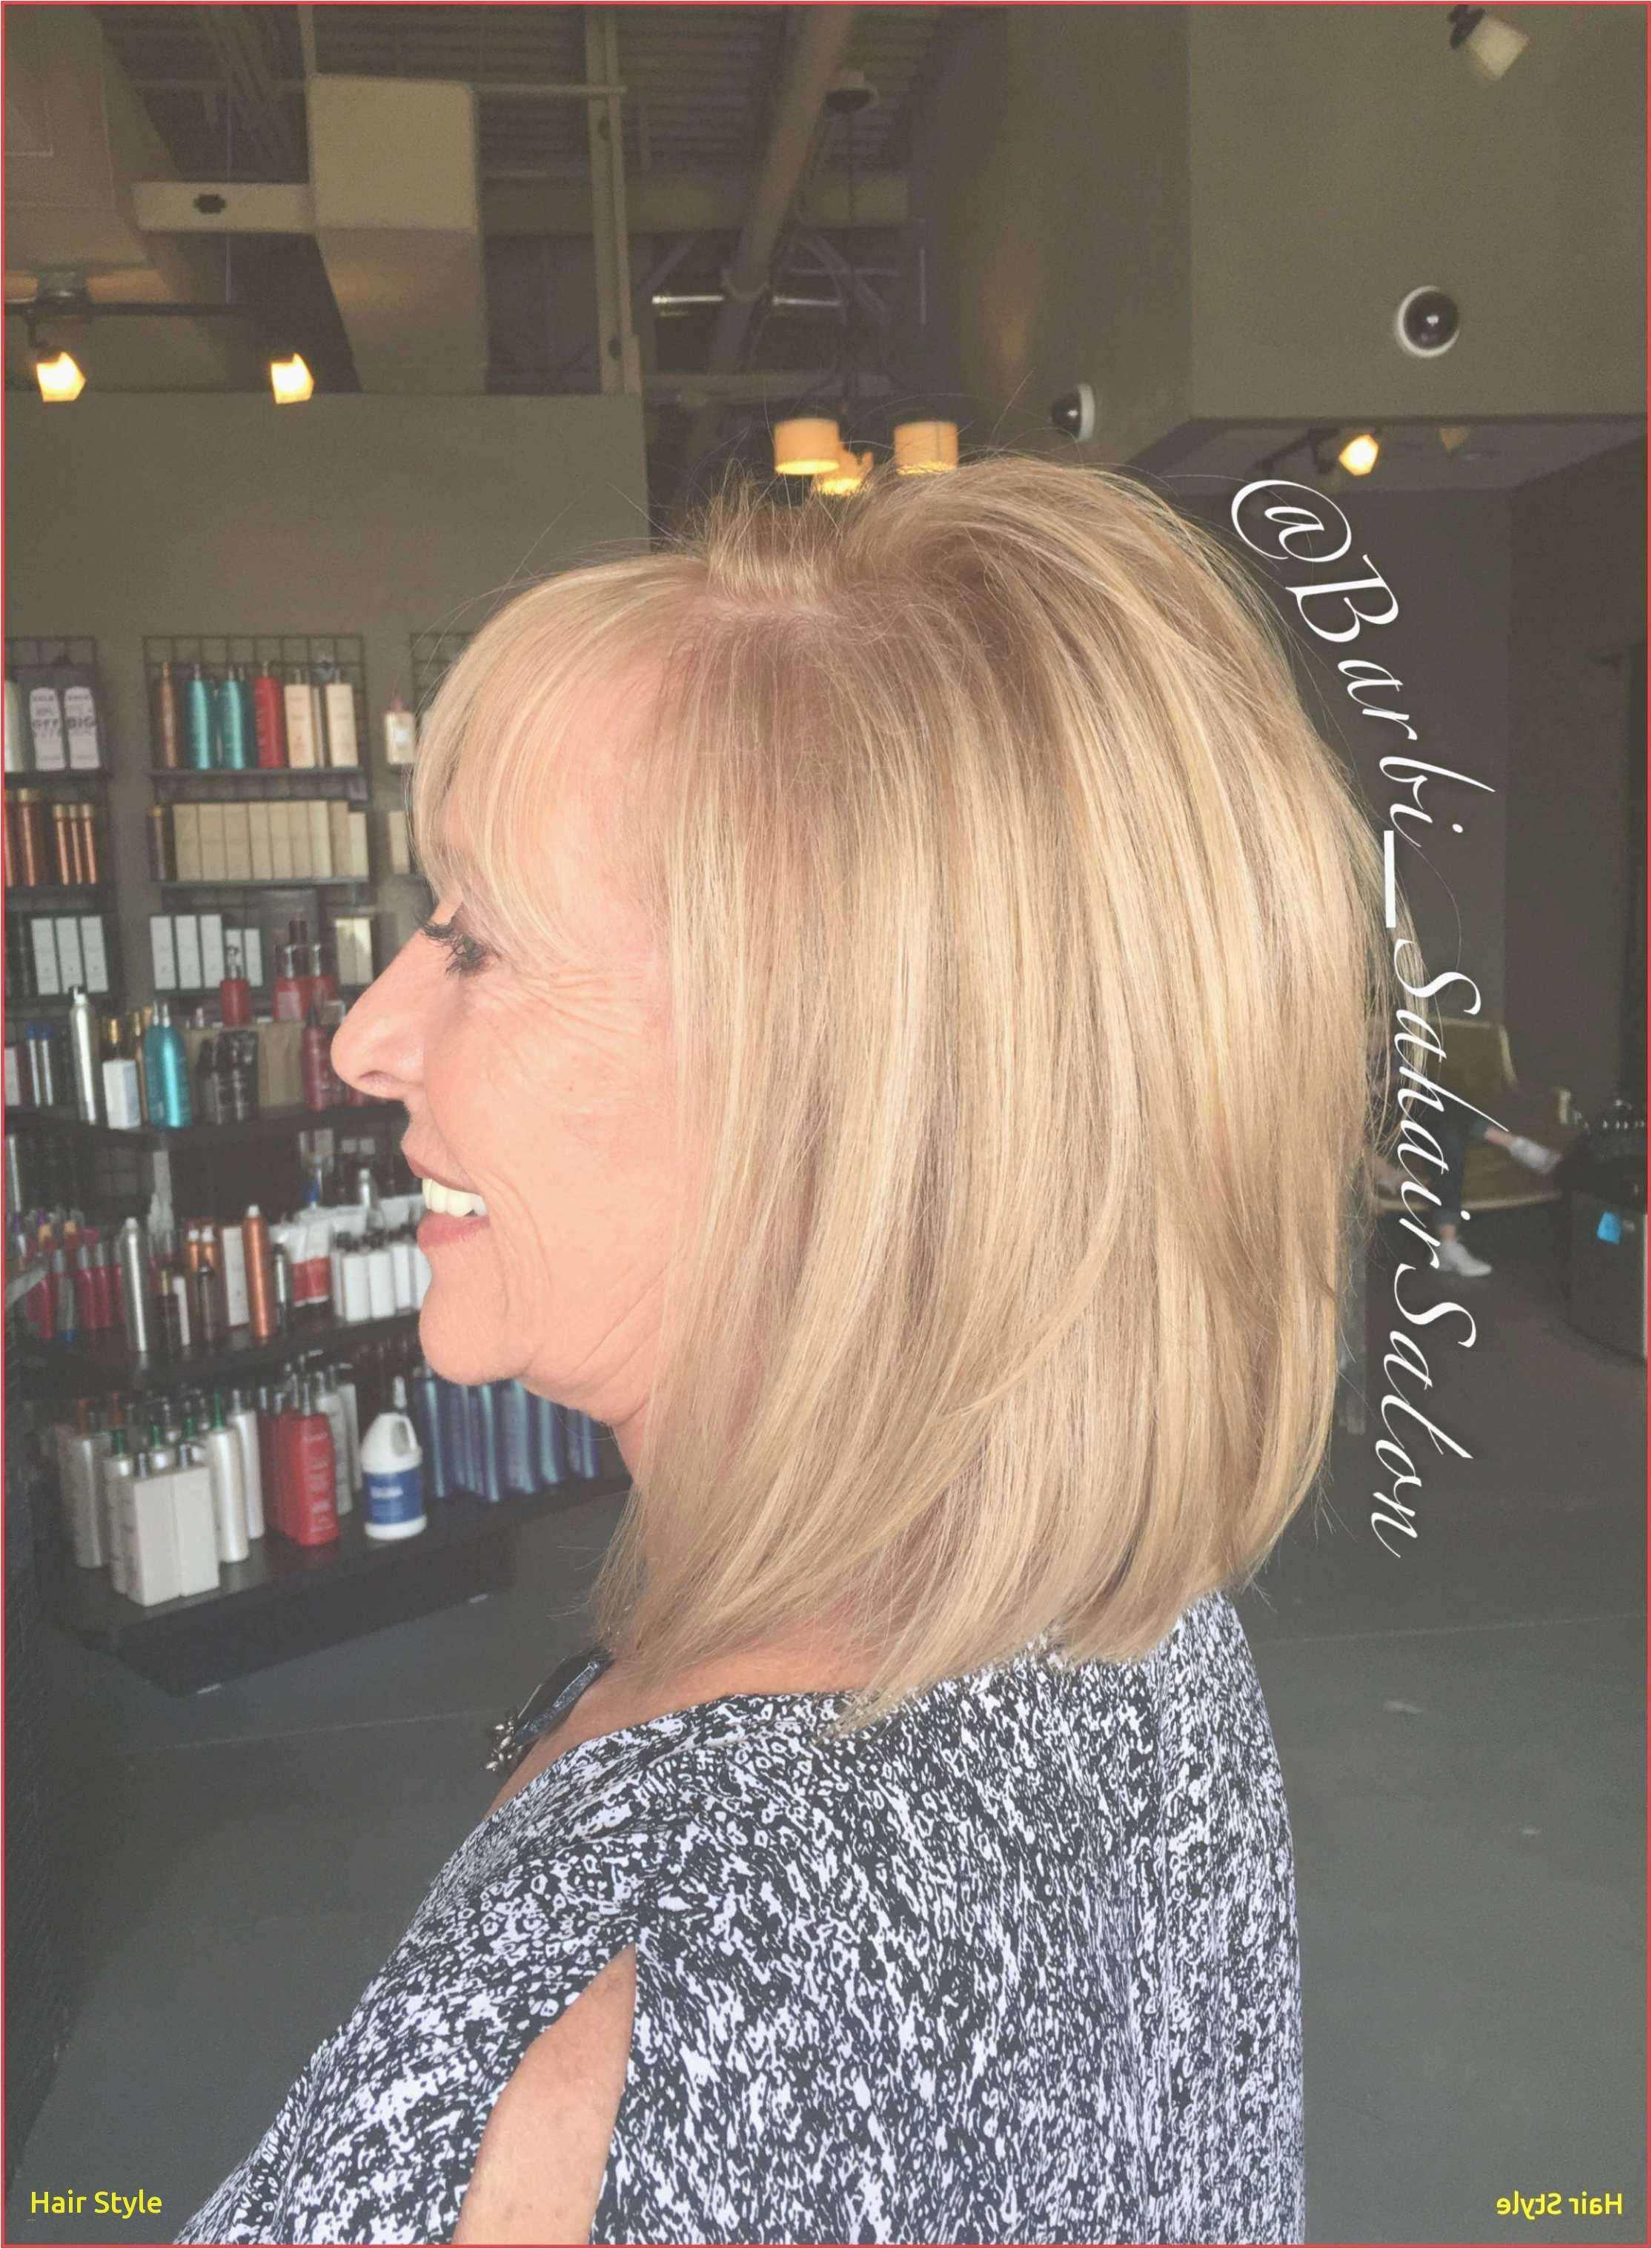 90s Mens Hairstyles Plan Fresh 90s Hairstyles Women Idea